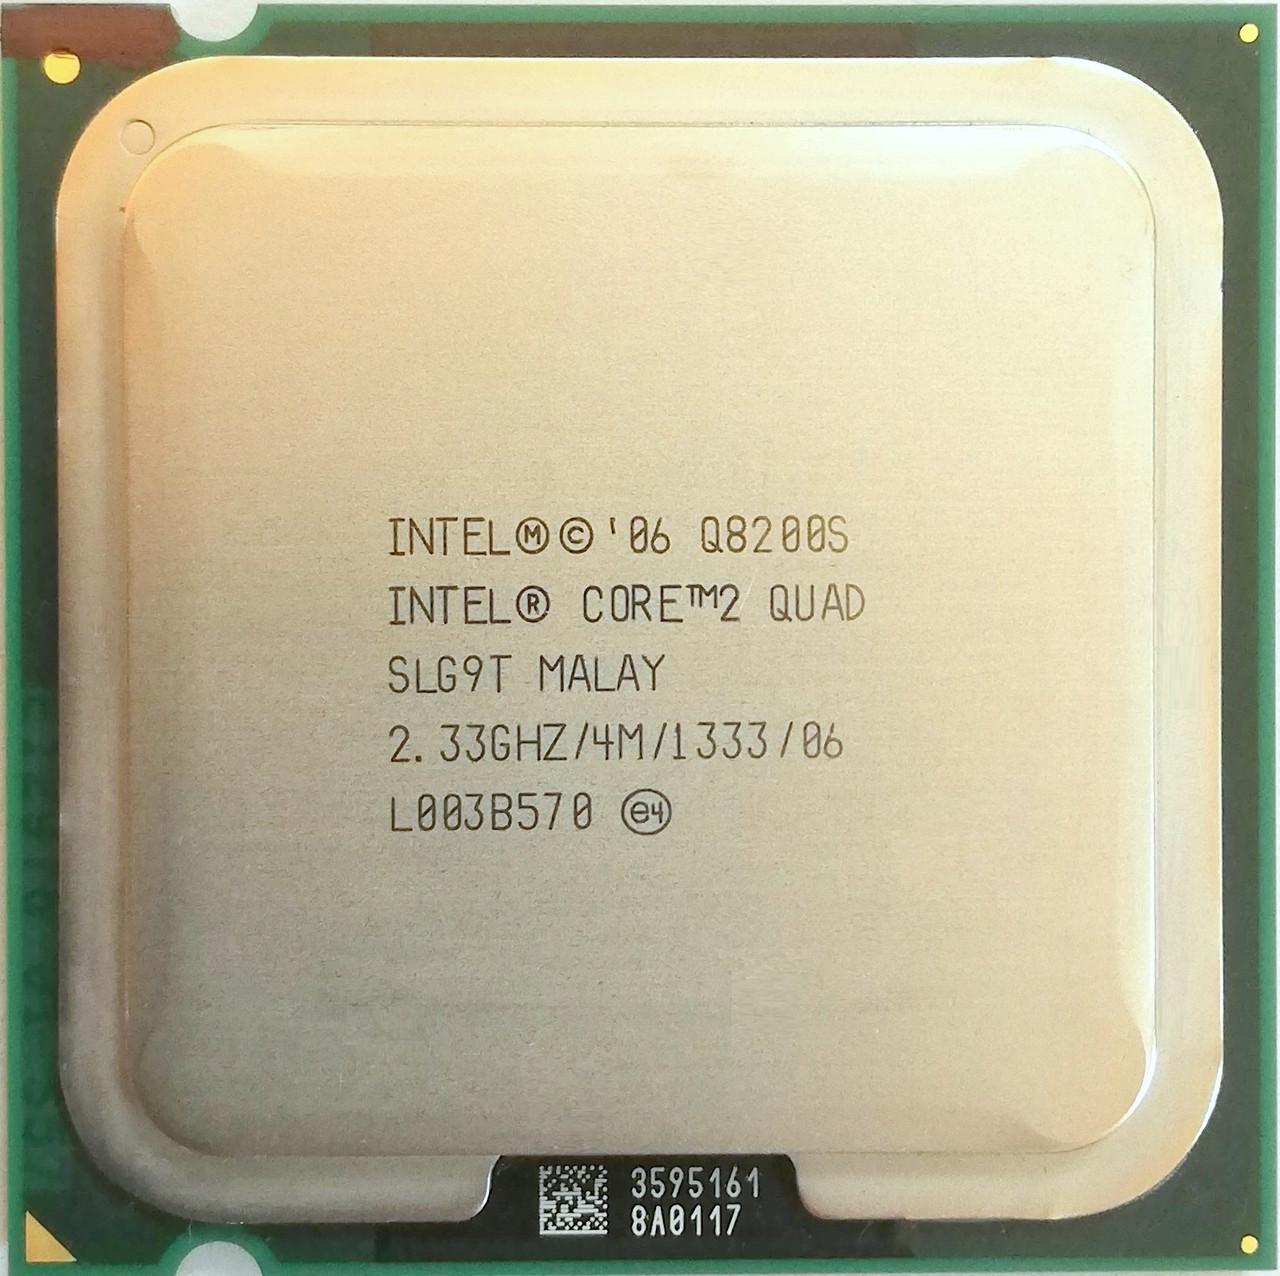 Процессор Intel Core 2 Quad Q8200S R0 SLG9T 2.33GHz 4M Cache 1333 MHz FSB Socket 775 Б/У